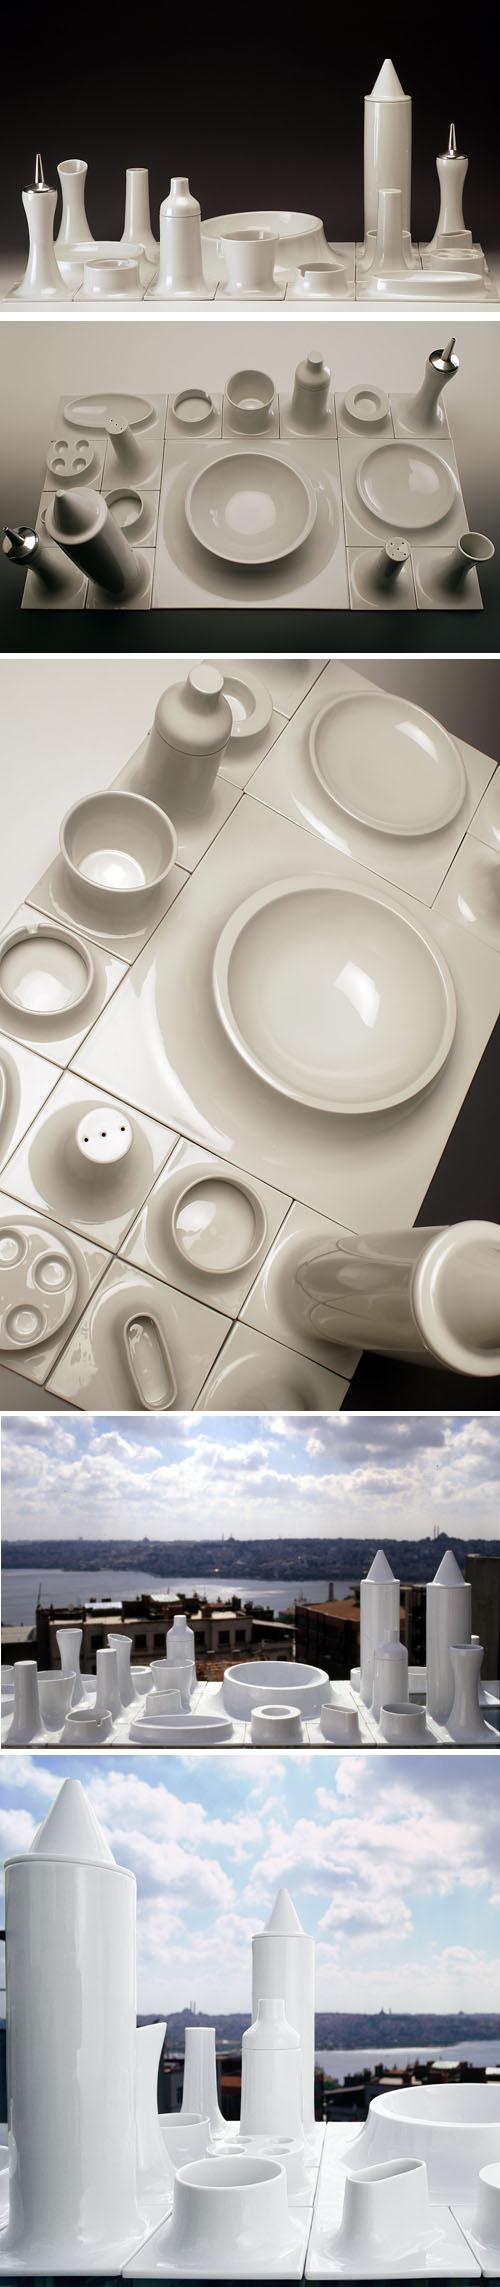 Karim Rashid: Morphescape Tableware: NOVA68.COM MODERN DESIGN :  home dining black and white porcelain